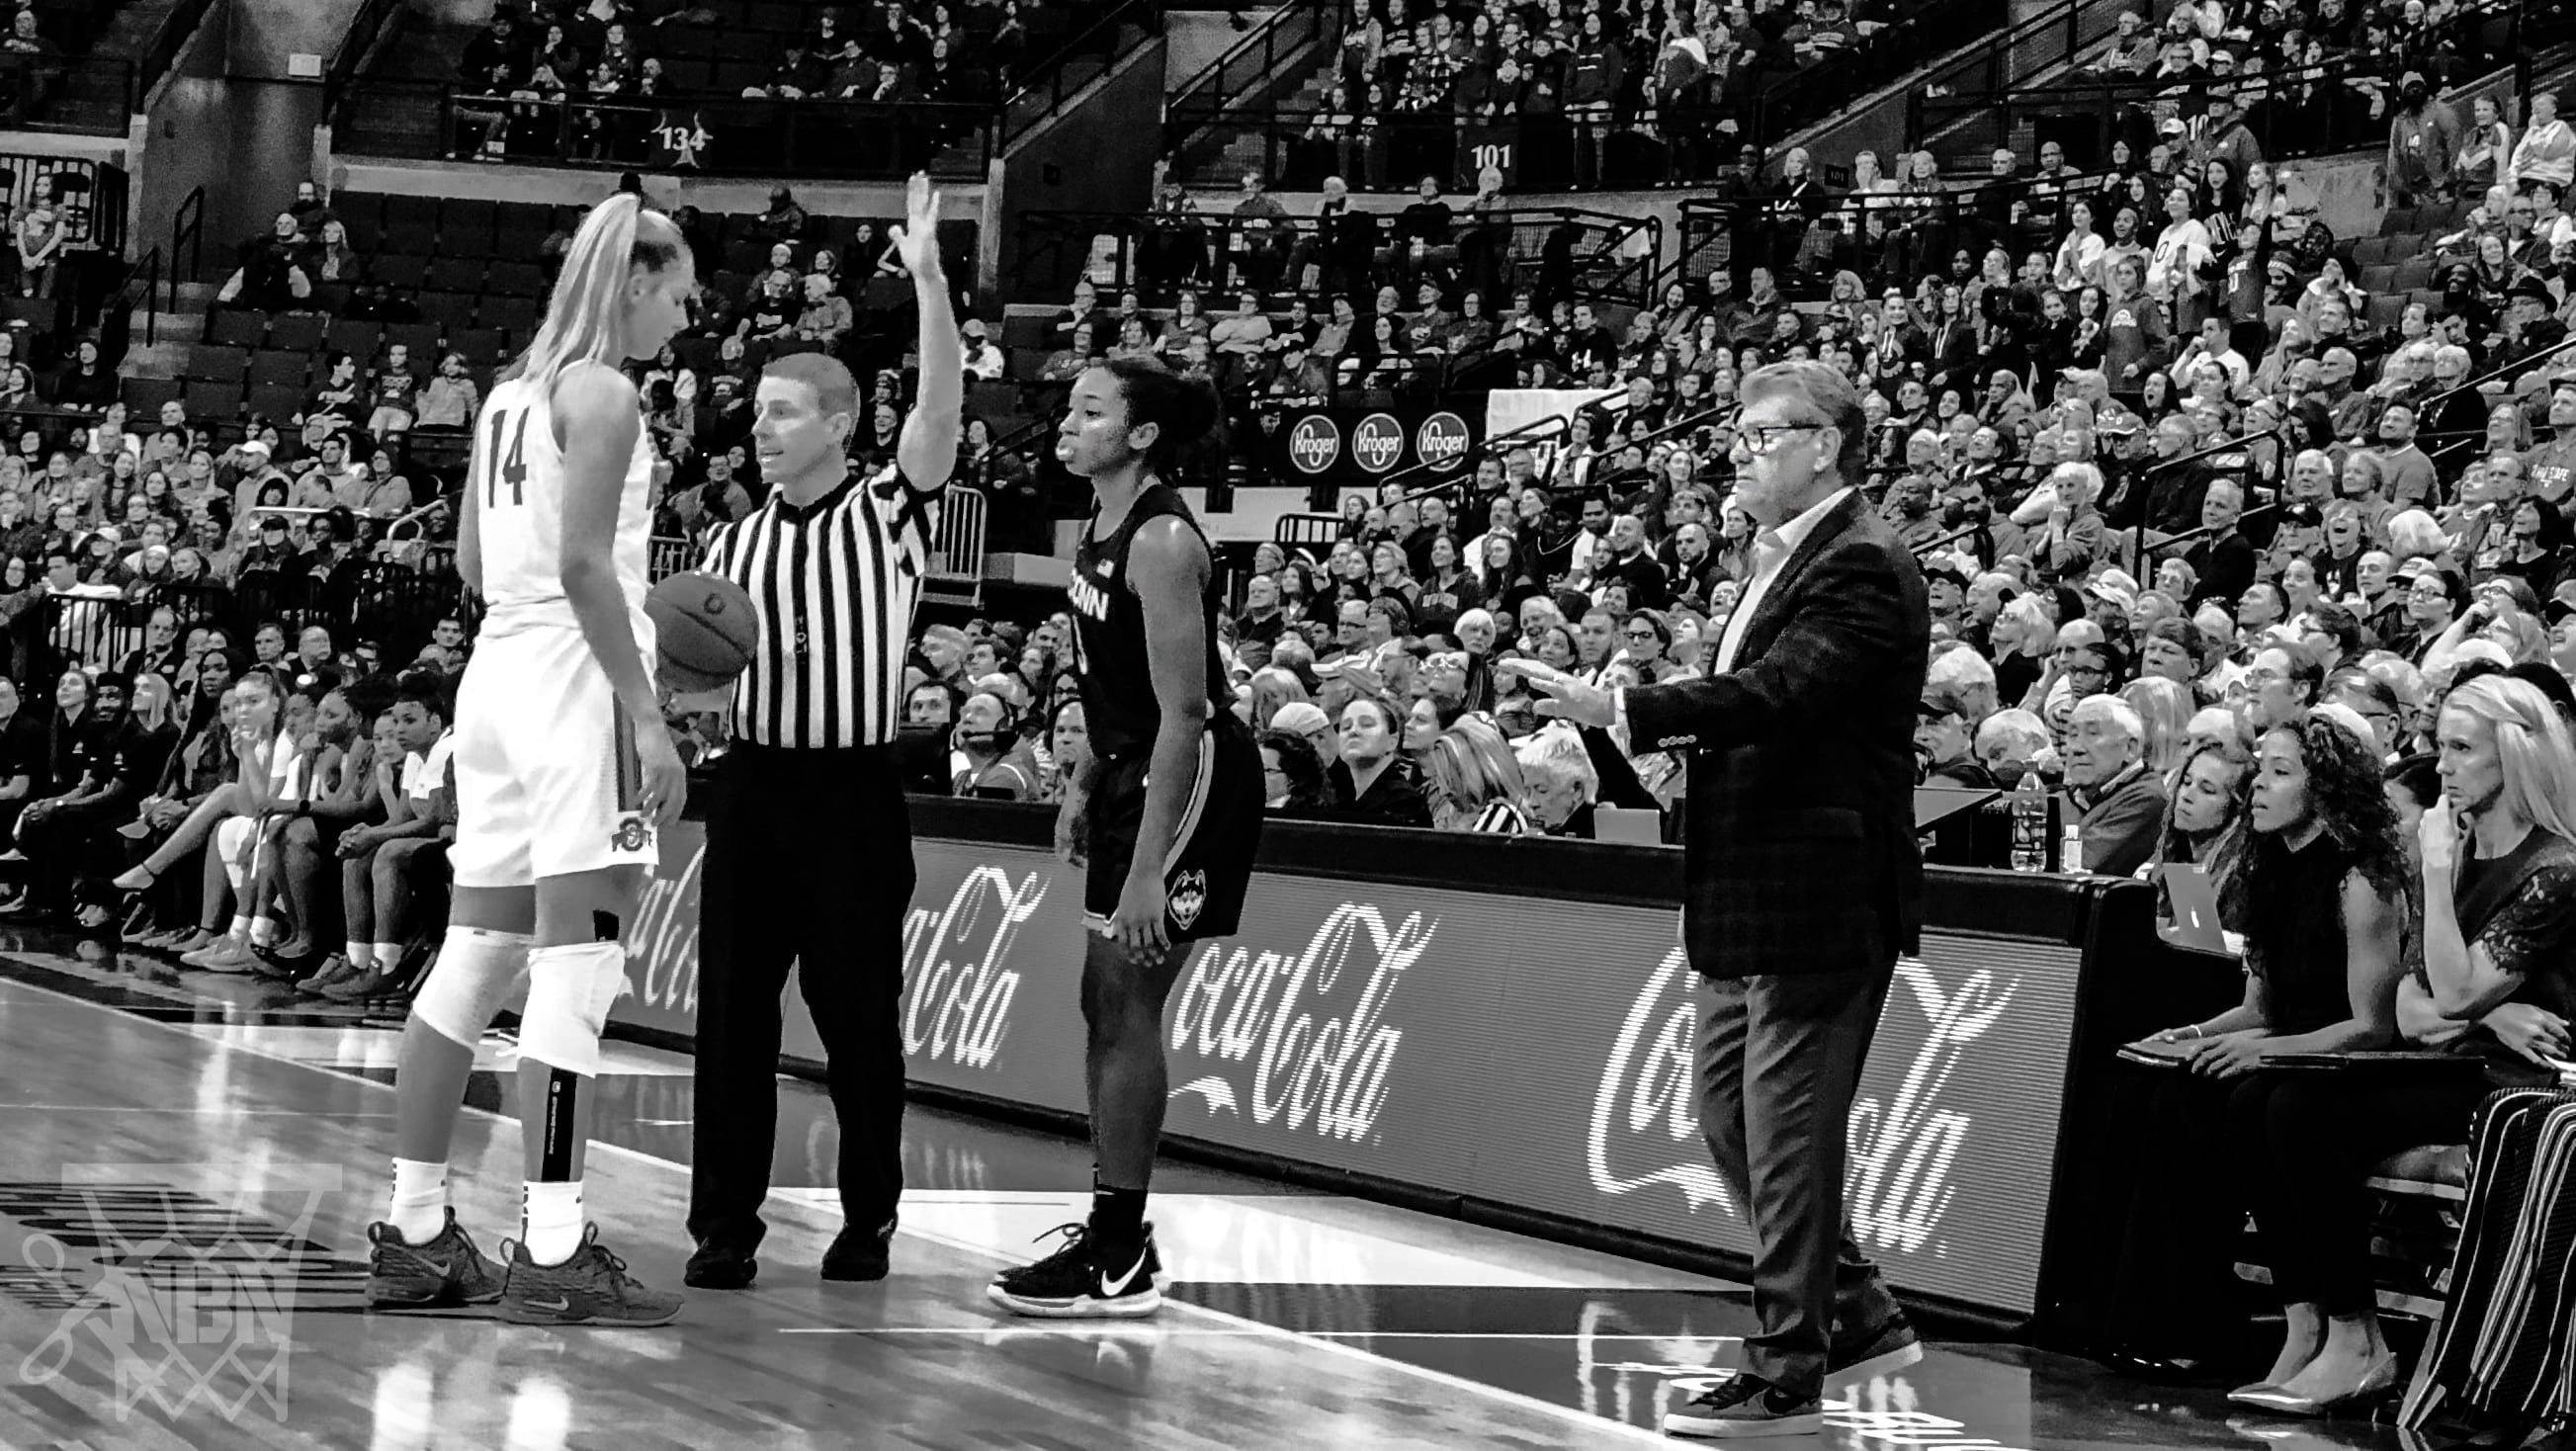 UConn Women's Basketball 2019-2020 Ohio State Geno Auriemma Mark Donahue Dorka Juhasz